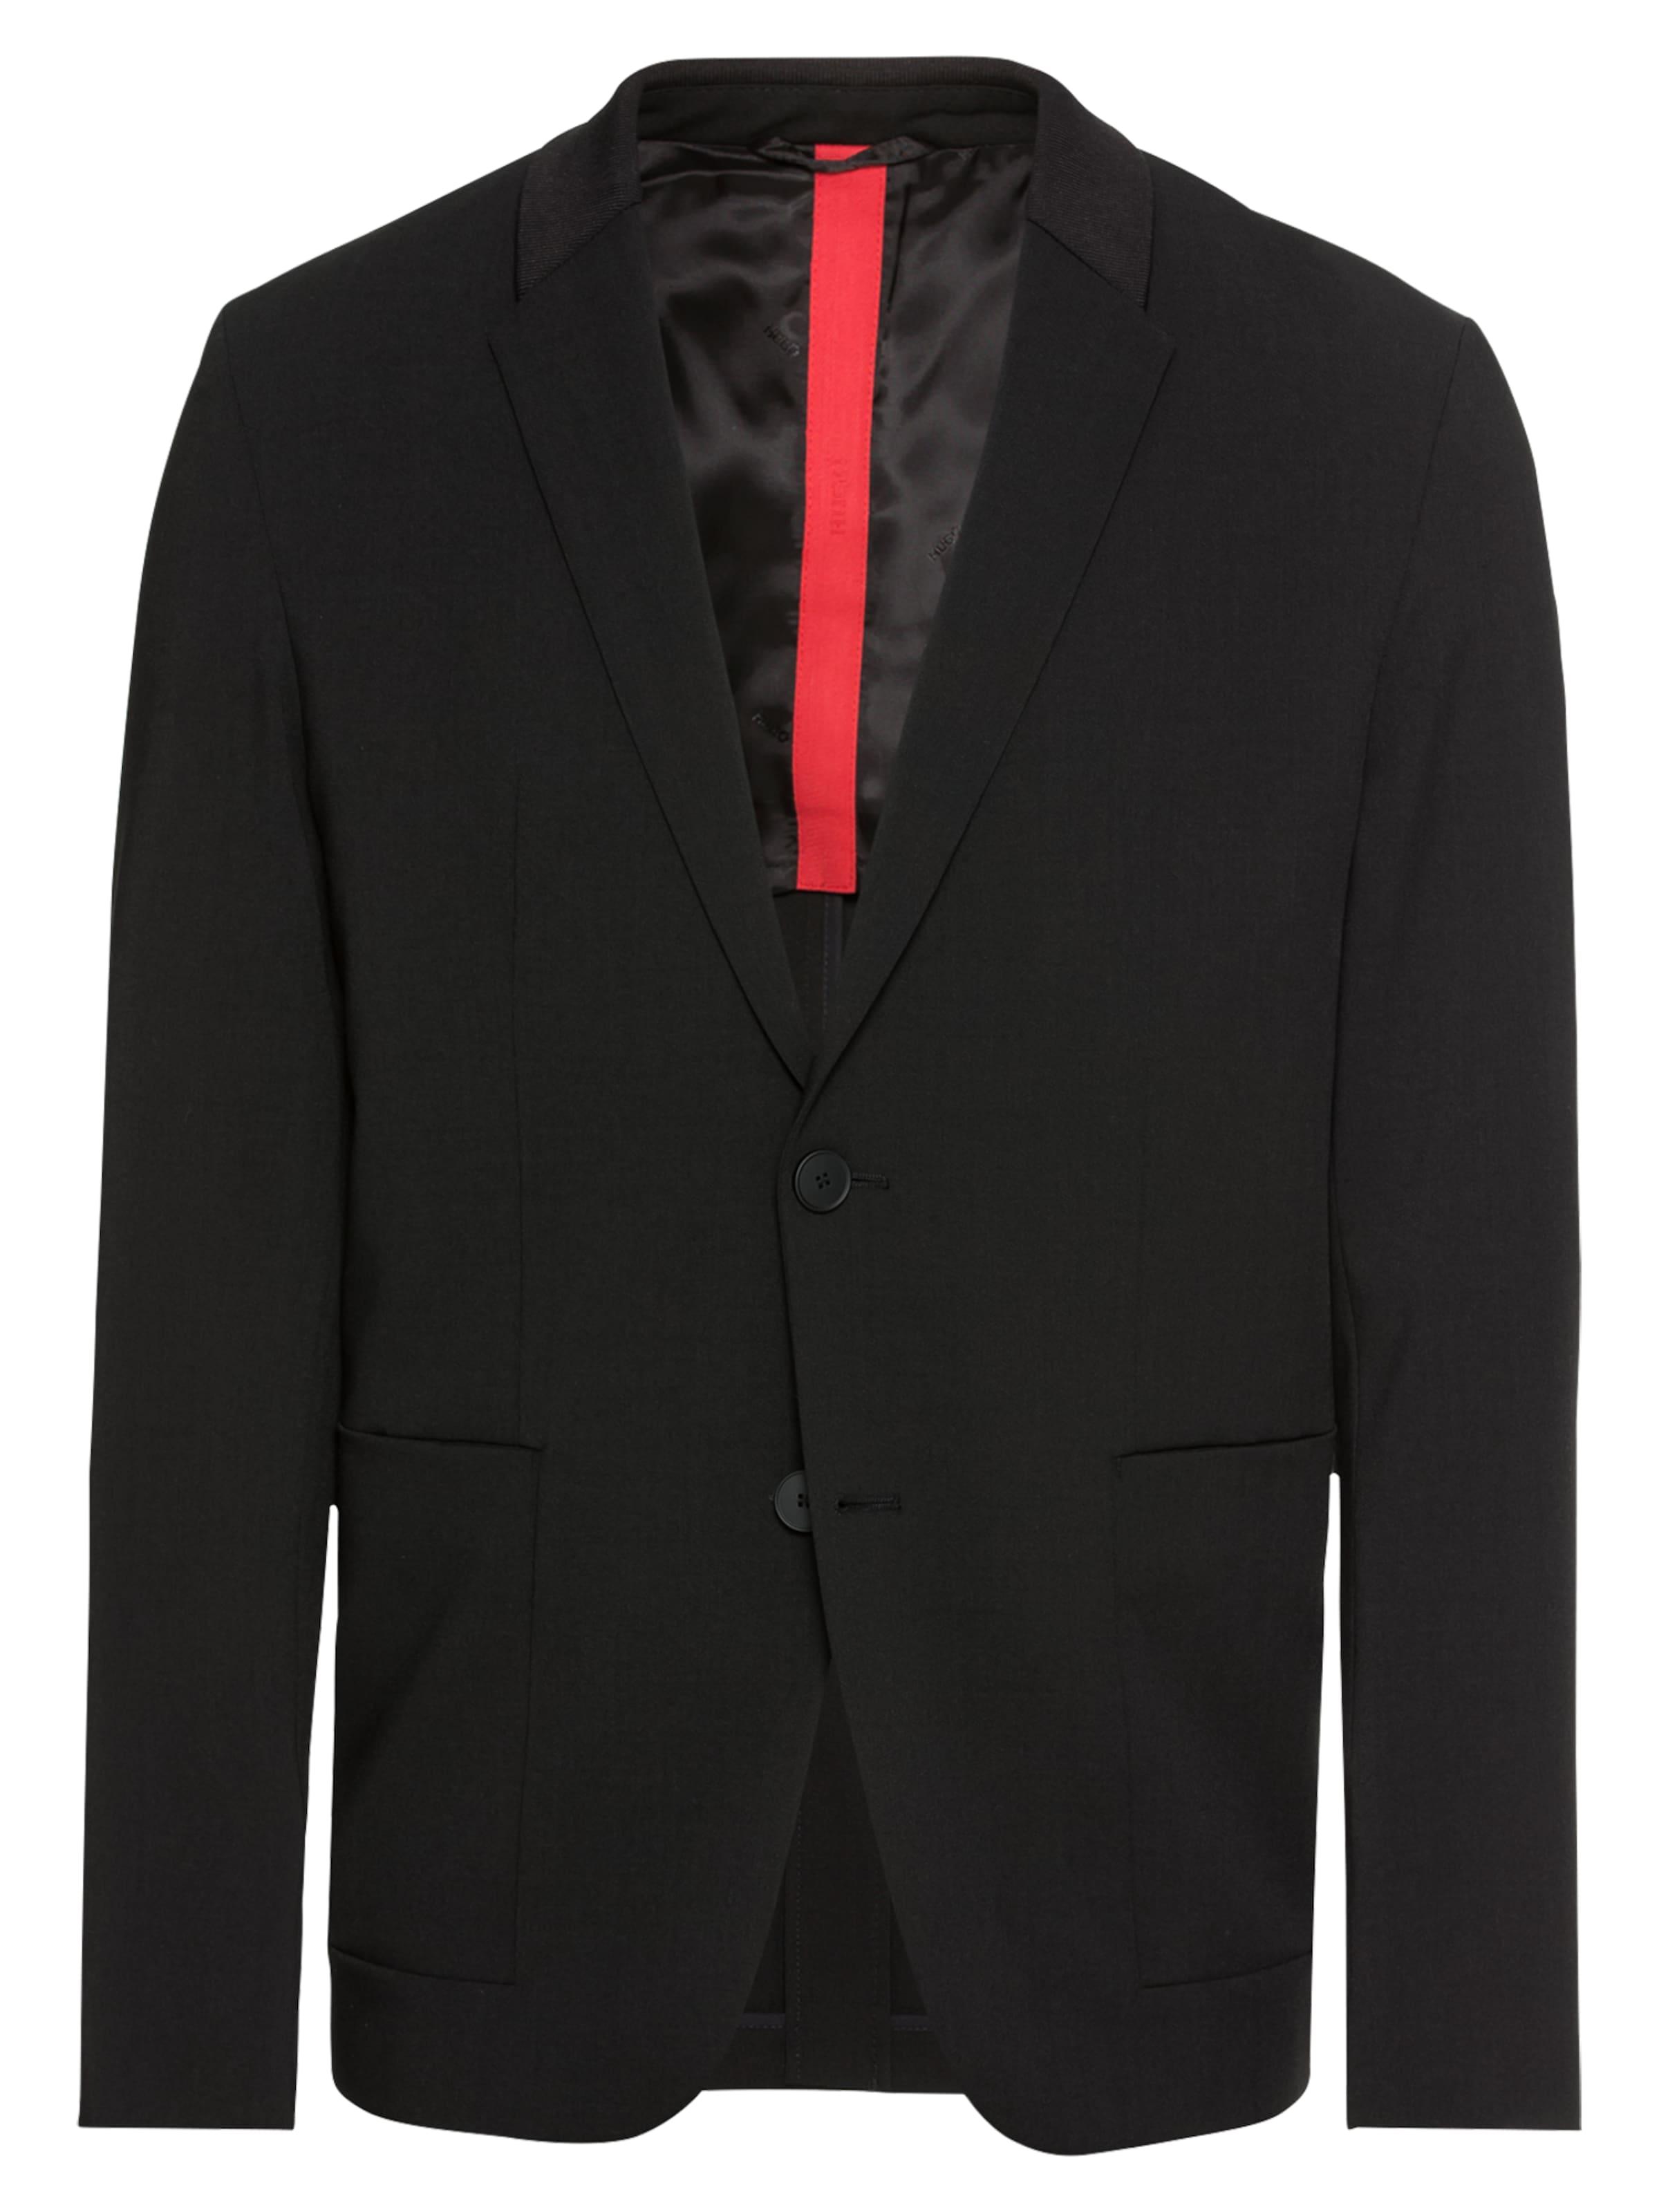 Costume Hugo 'joey' Noir De En Veste 7vyf6bYg